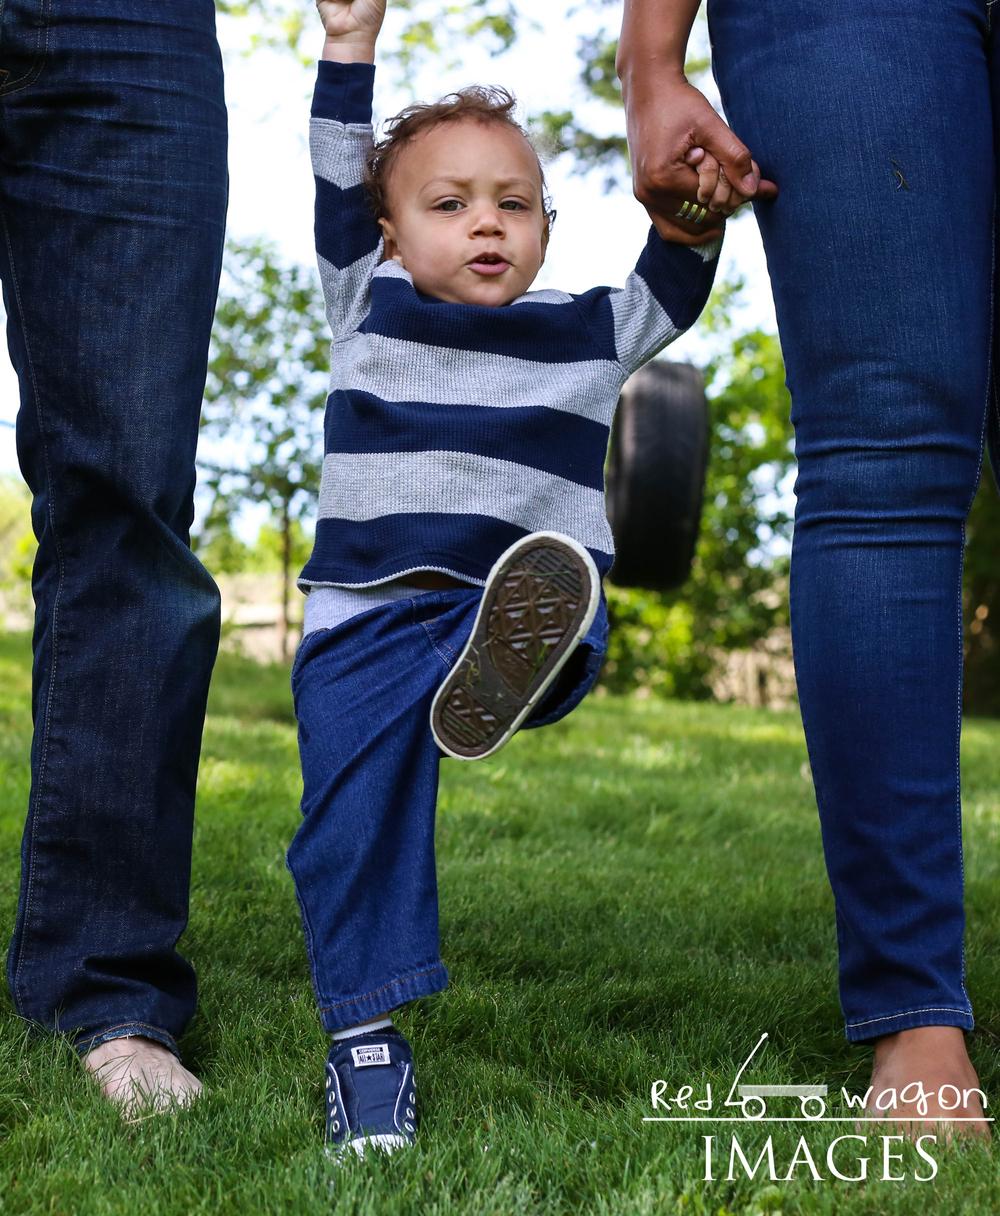 bostonfamilyphotography1